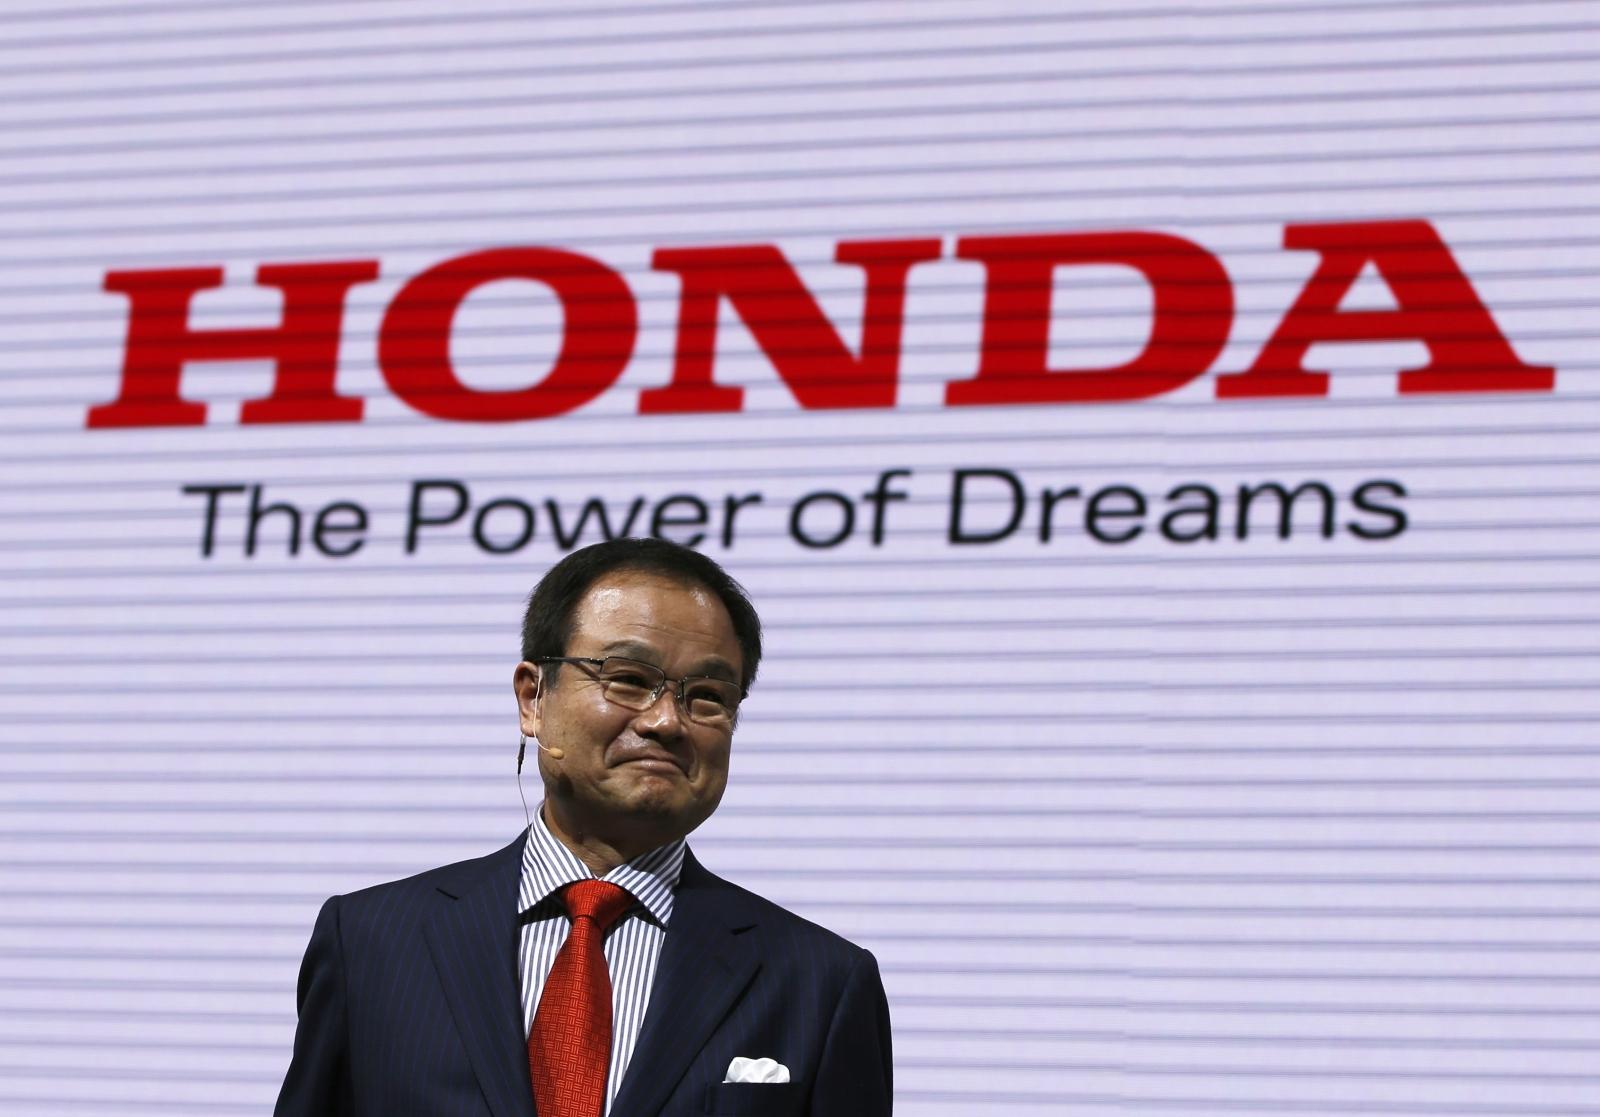 Honda Motor Co's President and Chief Executive Officer Takanobu Ito resigns.